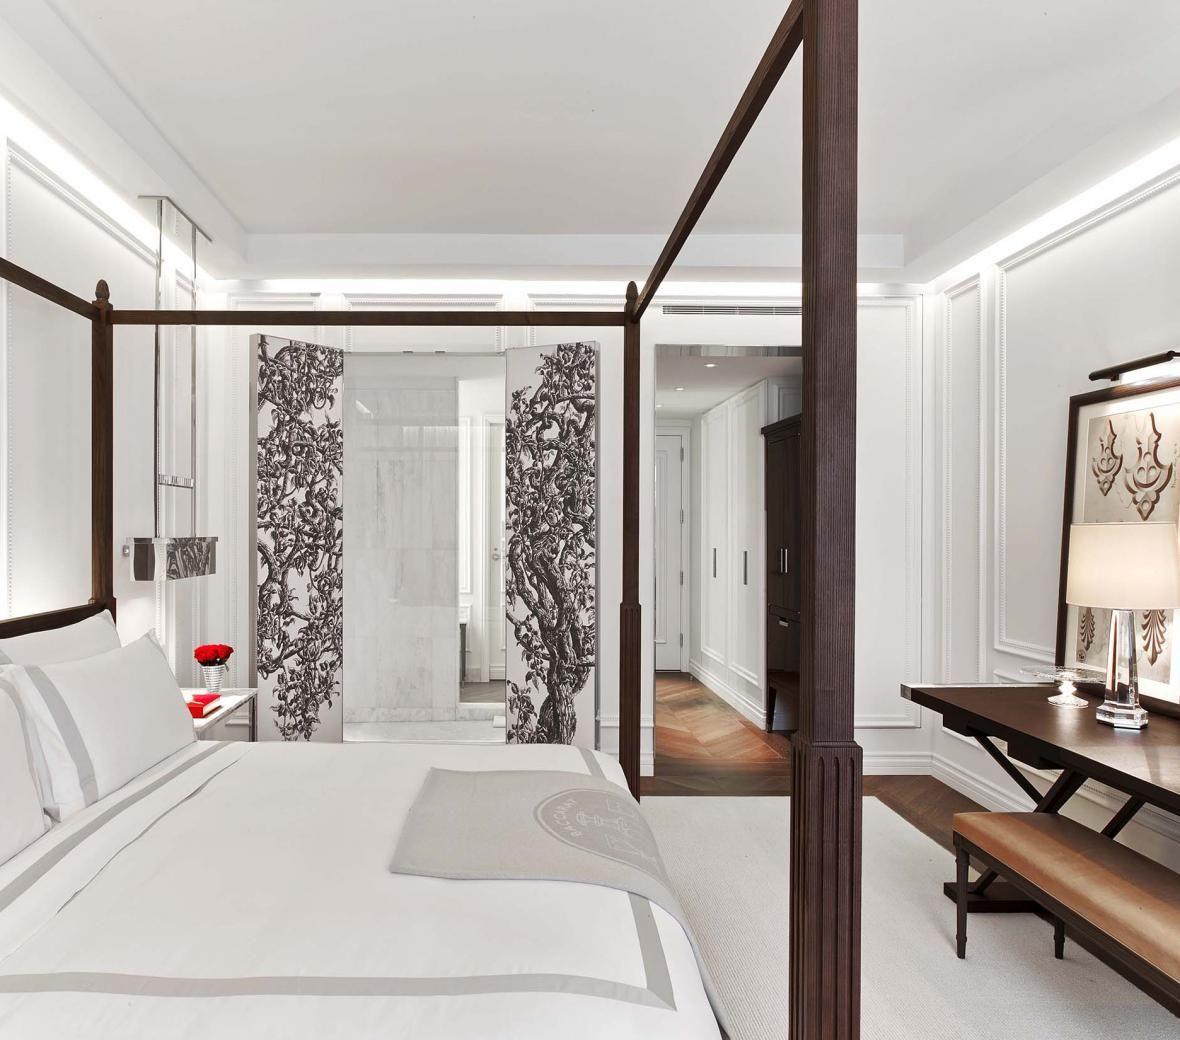 room baccarat hotel nyc june 2015 34 - Baccarat Hotel